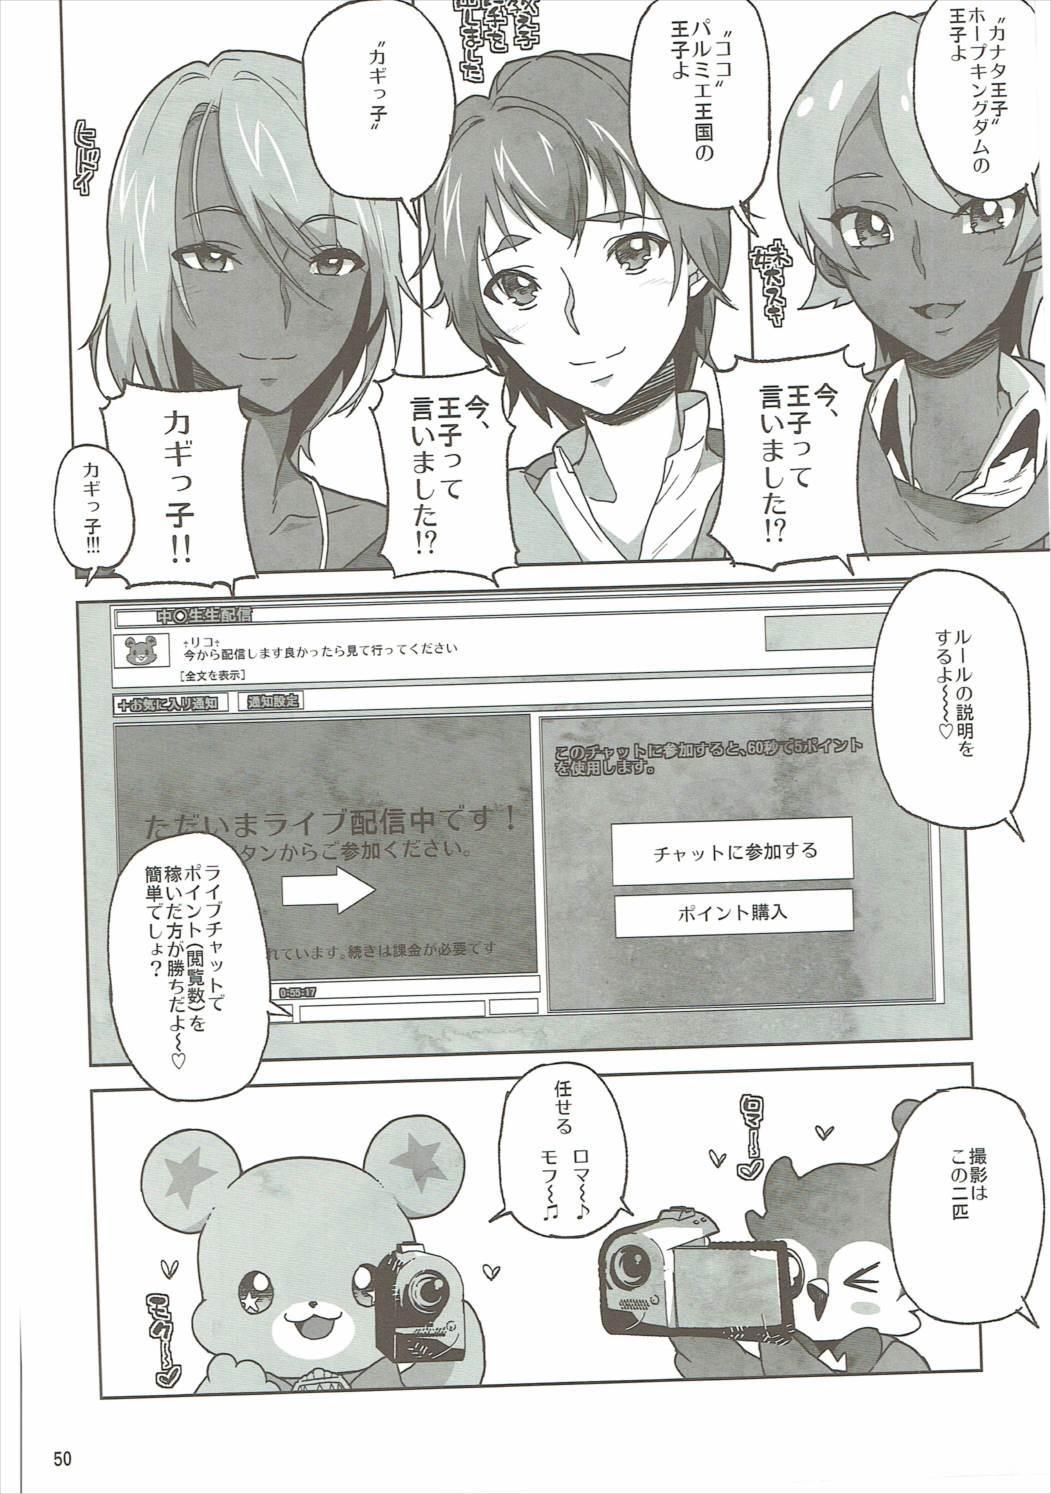 Amanogawa Kirara + Himelda + Mapuri Soushuuhen 48